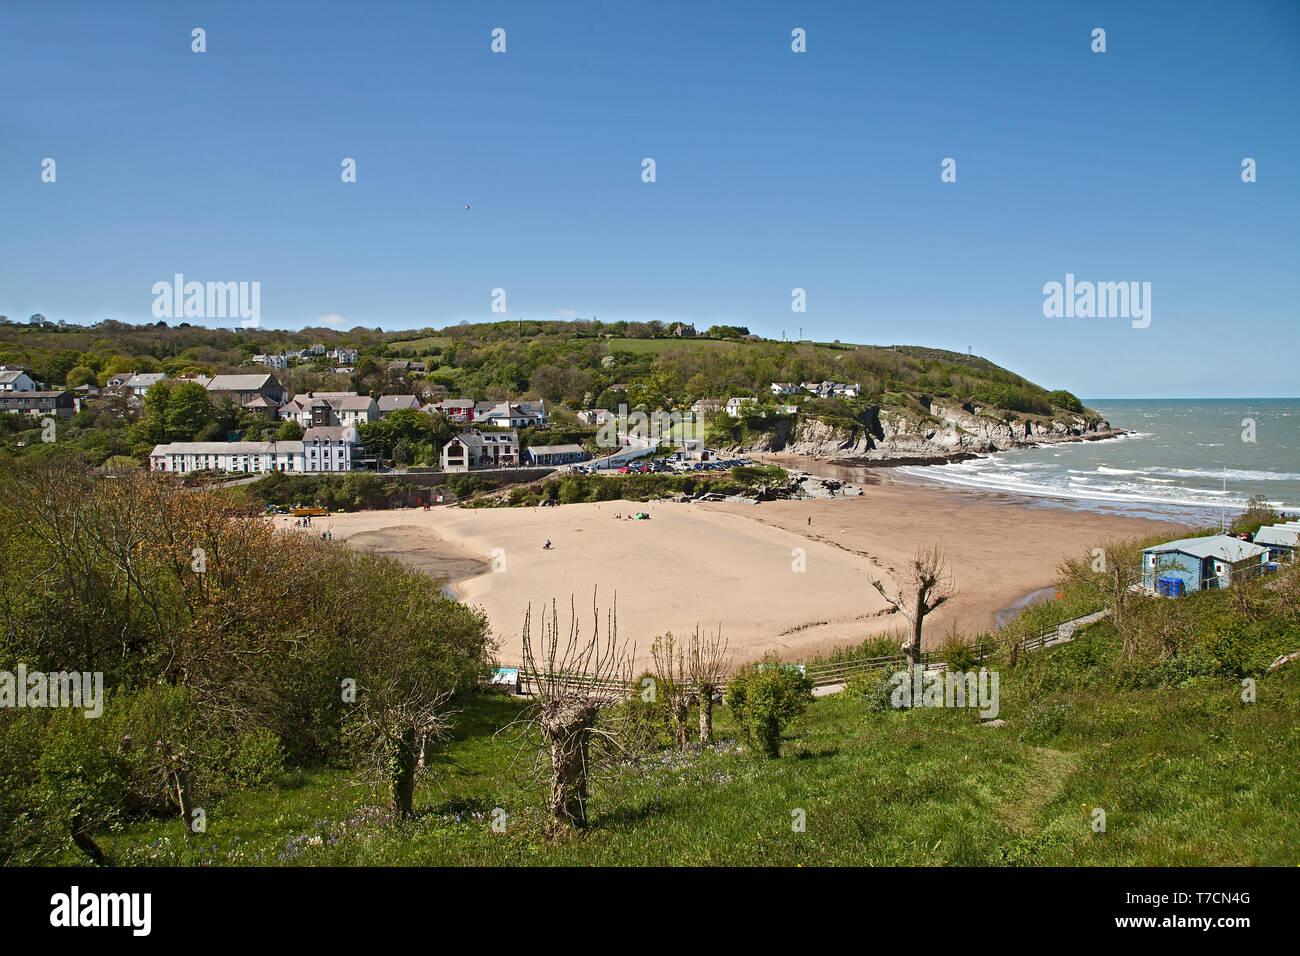 Aberporth Beach, Ceredigion, West Wales, UK - Stock Image